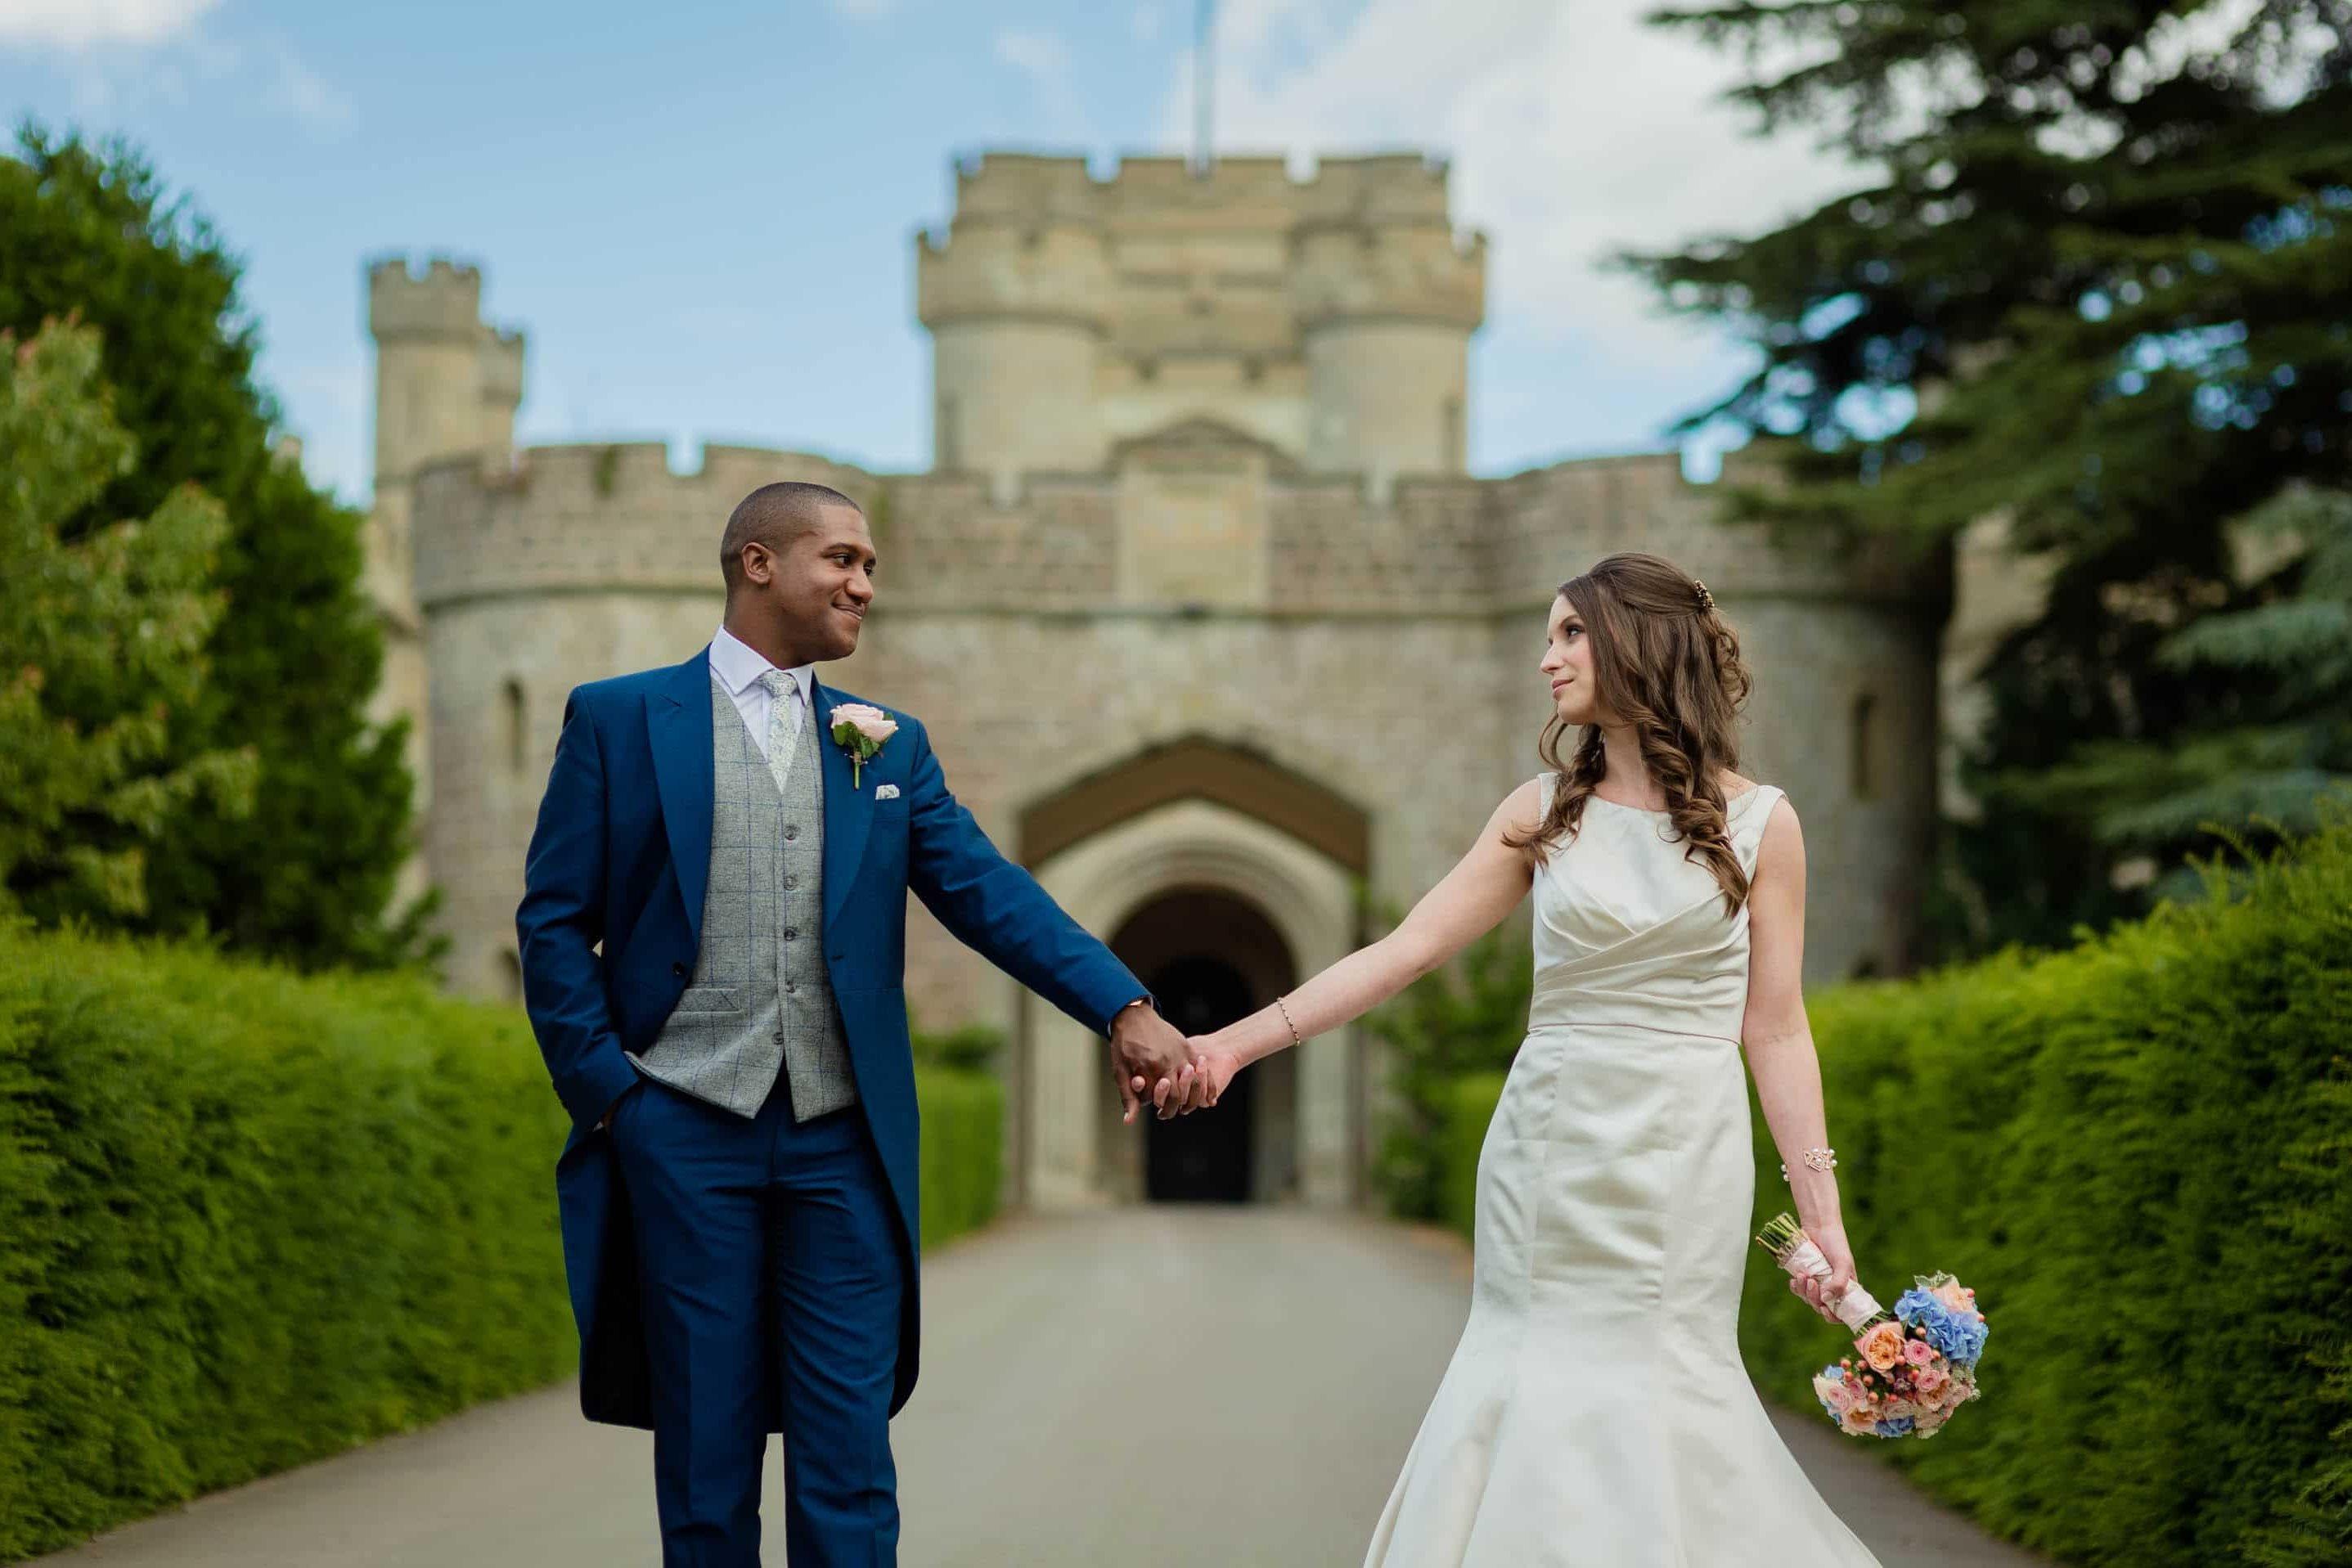 Eastnor Castle wedding in Herefordshire, West Midlands - Helen + Barrington 24